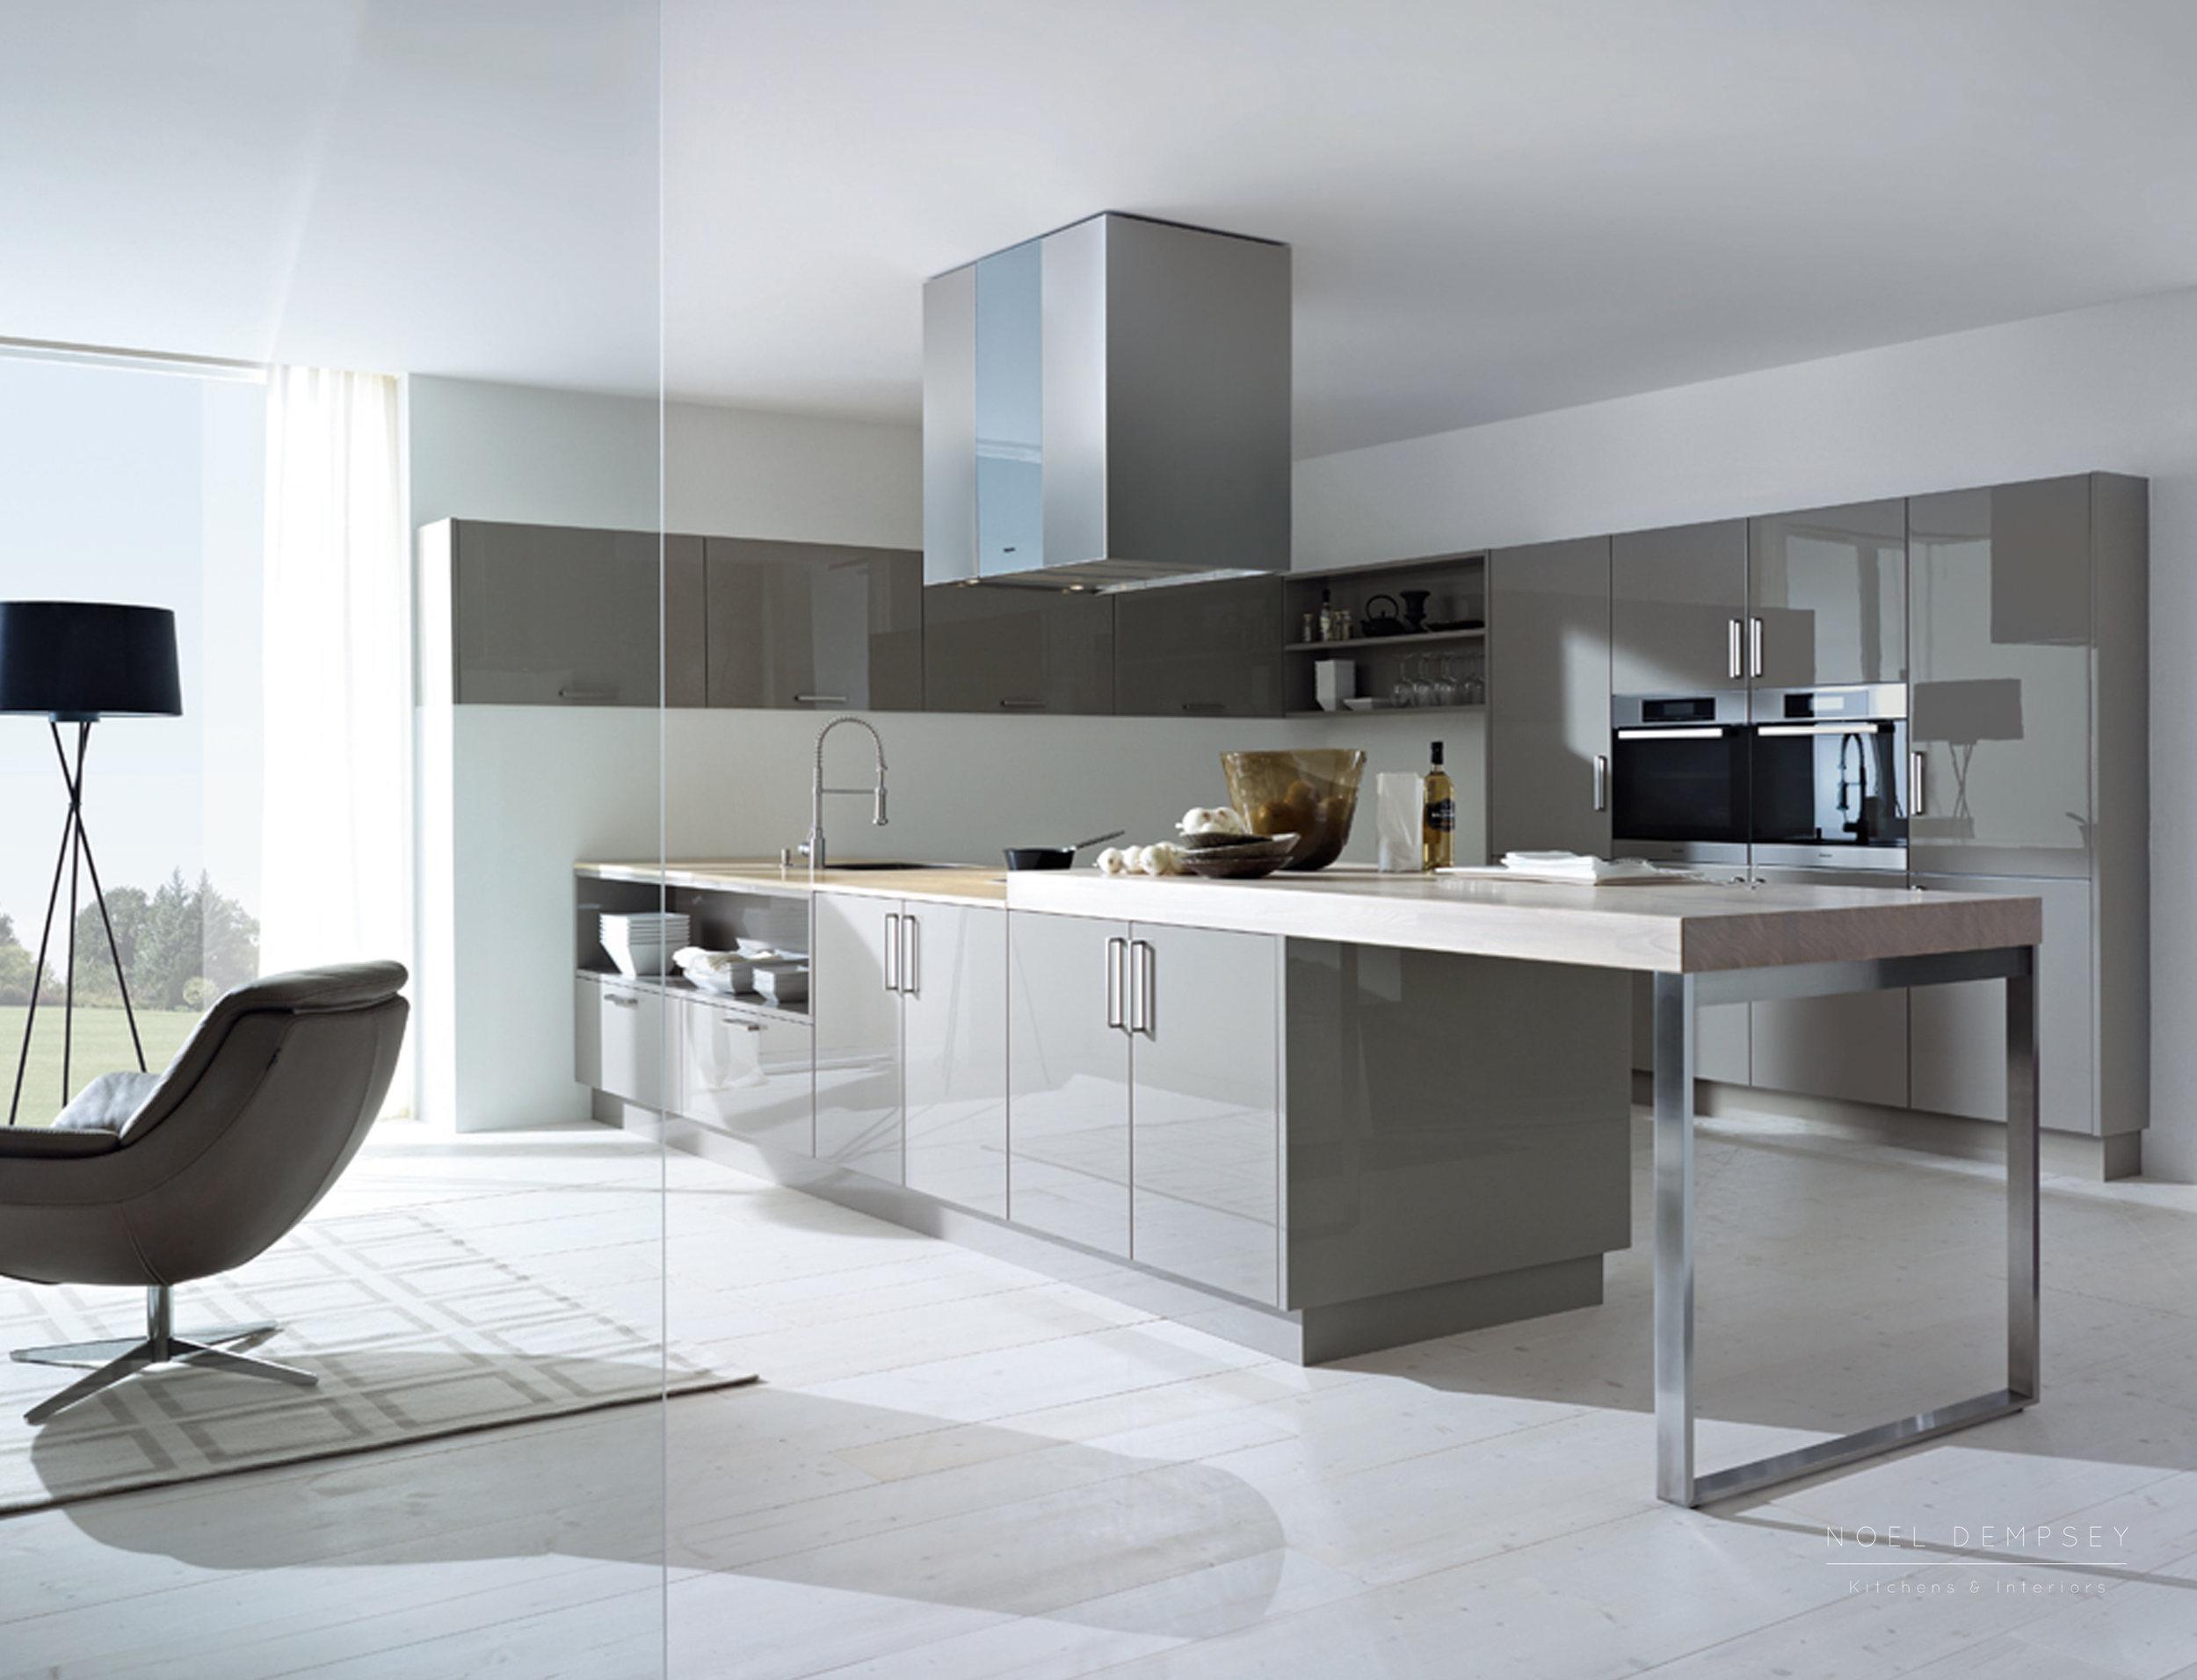 NX501-Truffle-High-Gloss-German-Kitchen-2.jpg